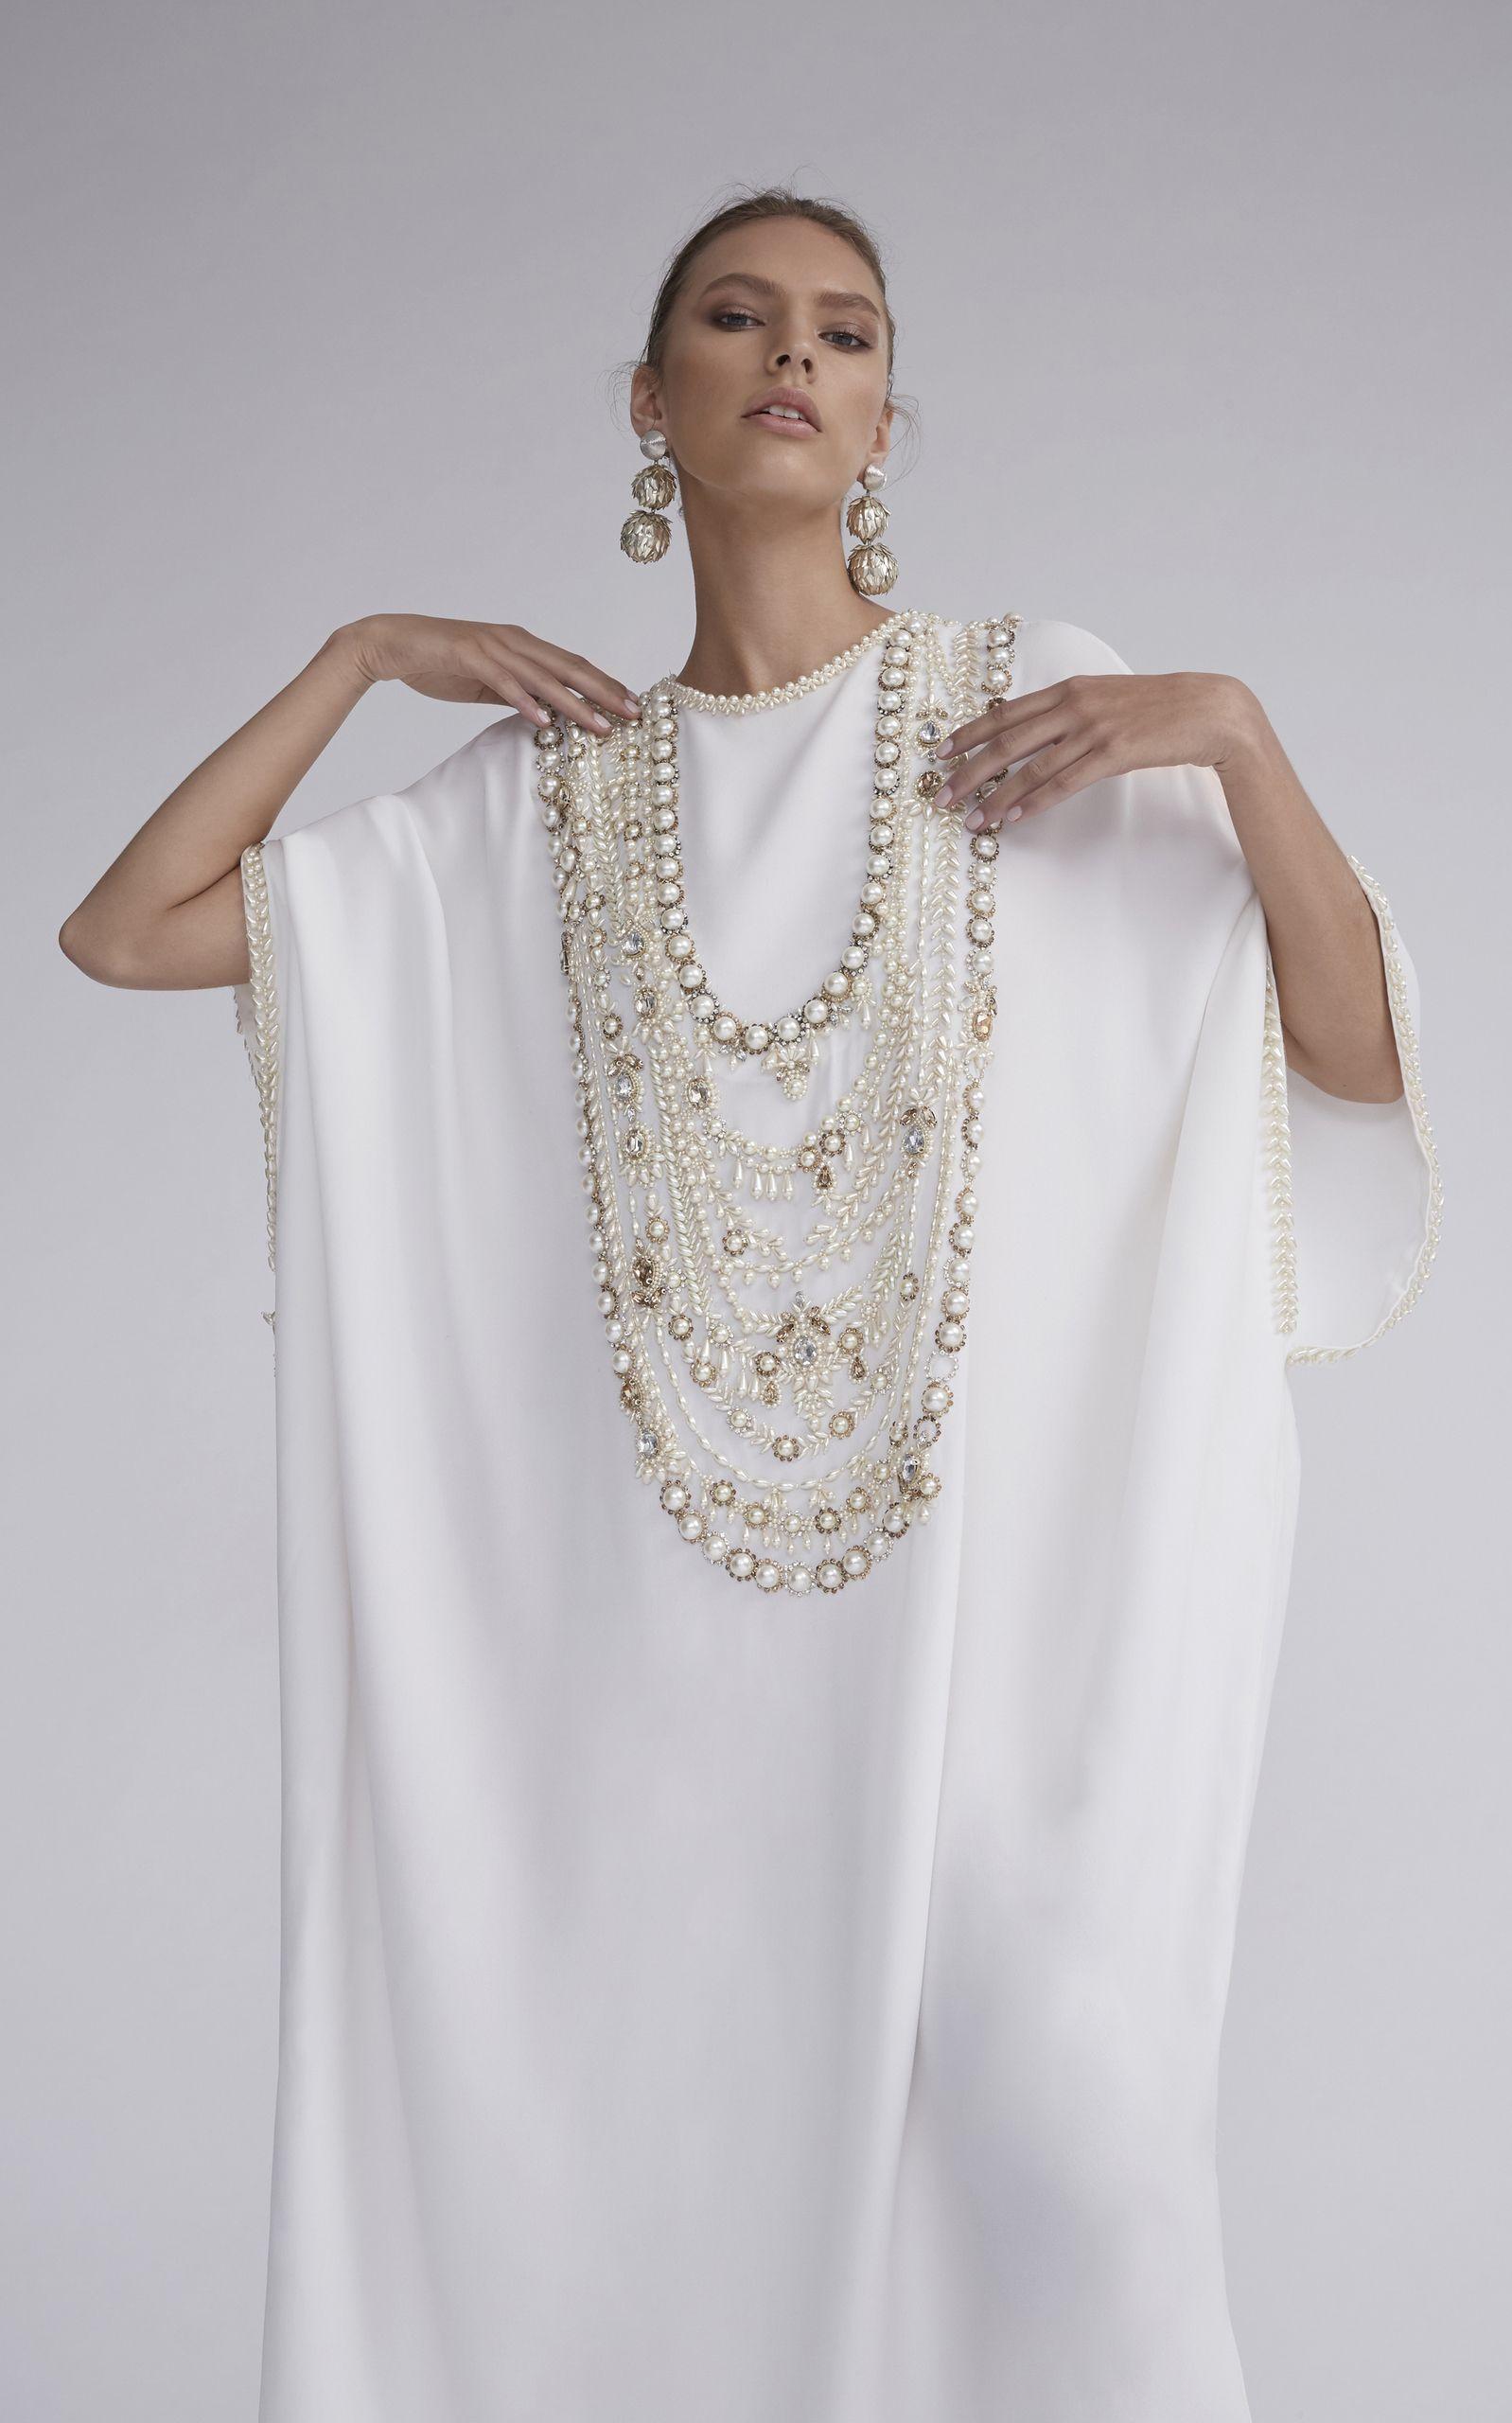 Marchesa Fashion Collections For Women | Moda Operandi